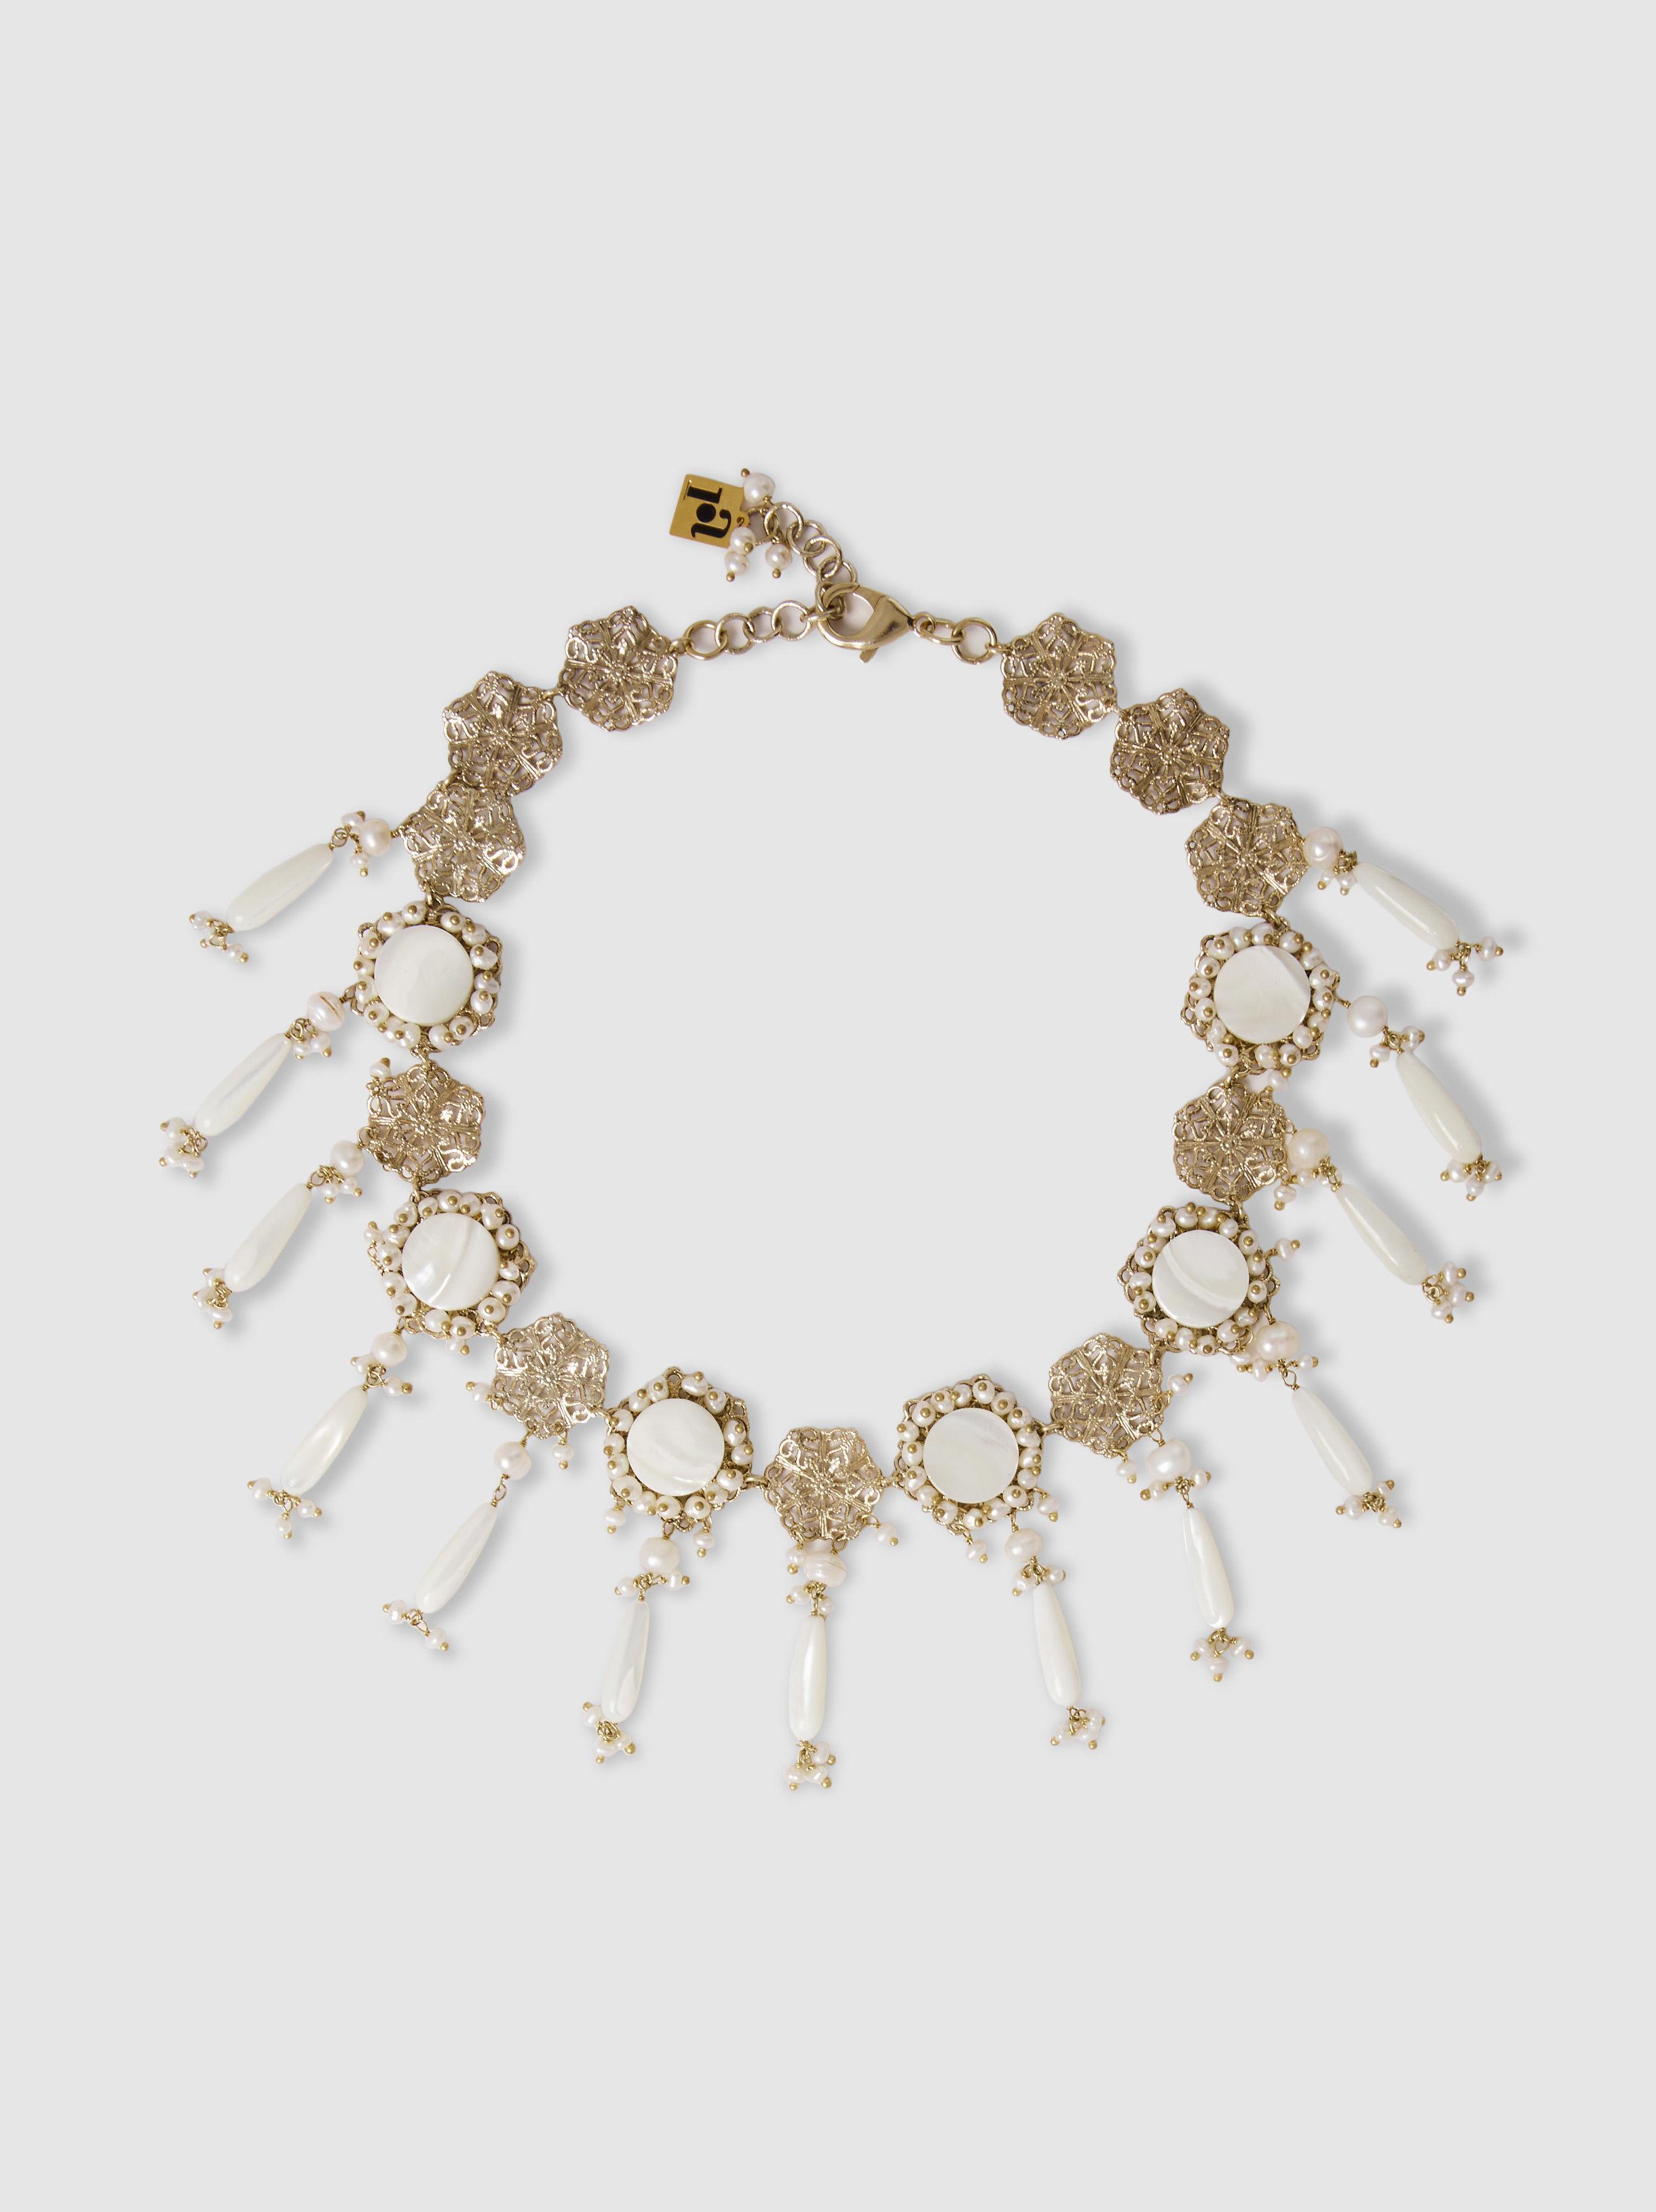 Rosantica Rosantica Woman Nebbia Gold-plated Freshwater Pearl Tassel Necklace Gold Size jl38HgbWWV